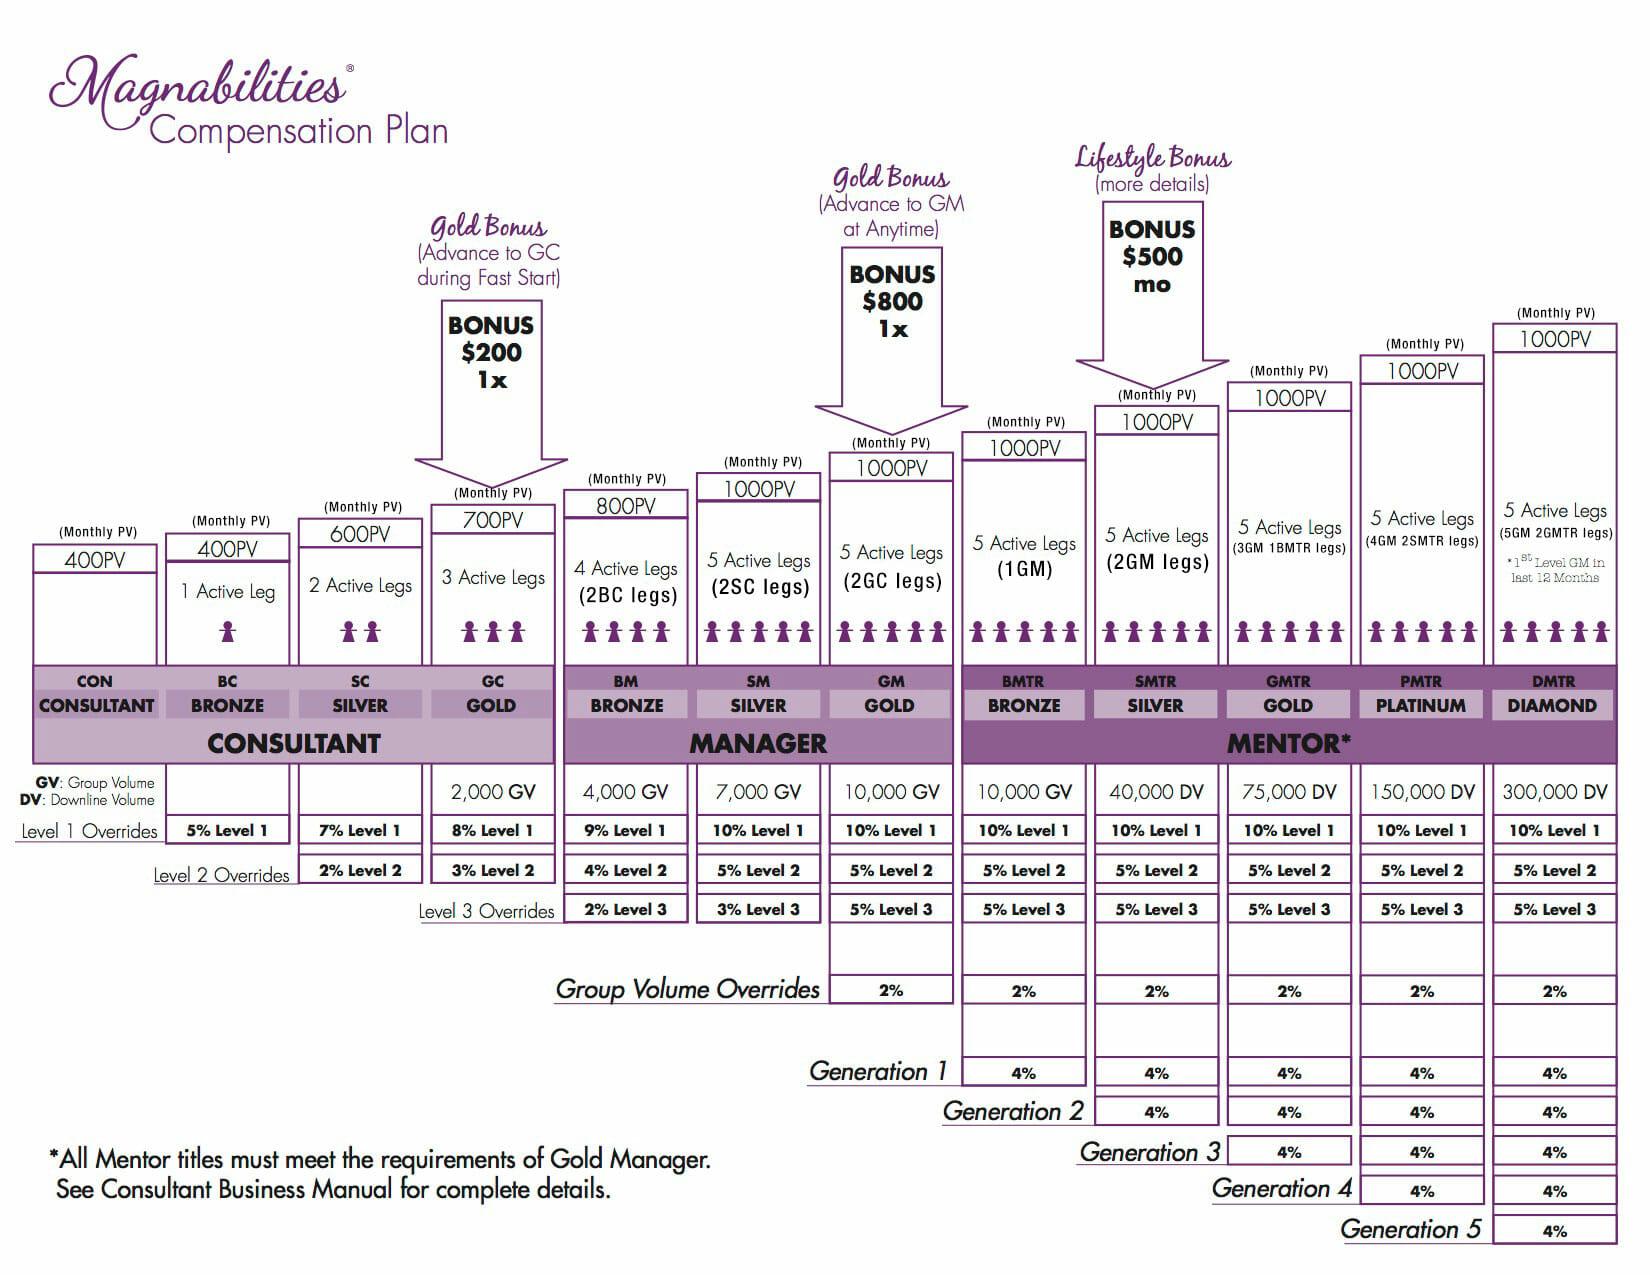 magnabilities compensation plan